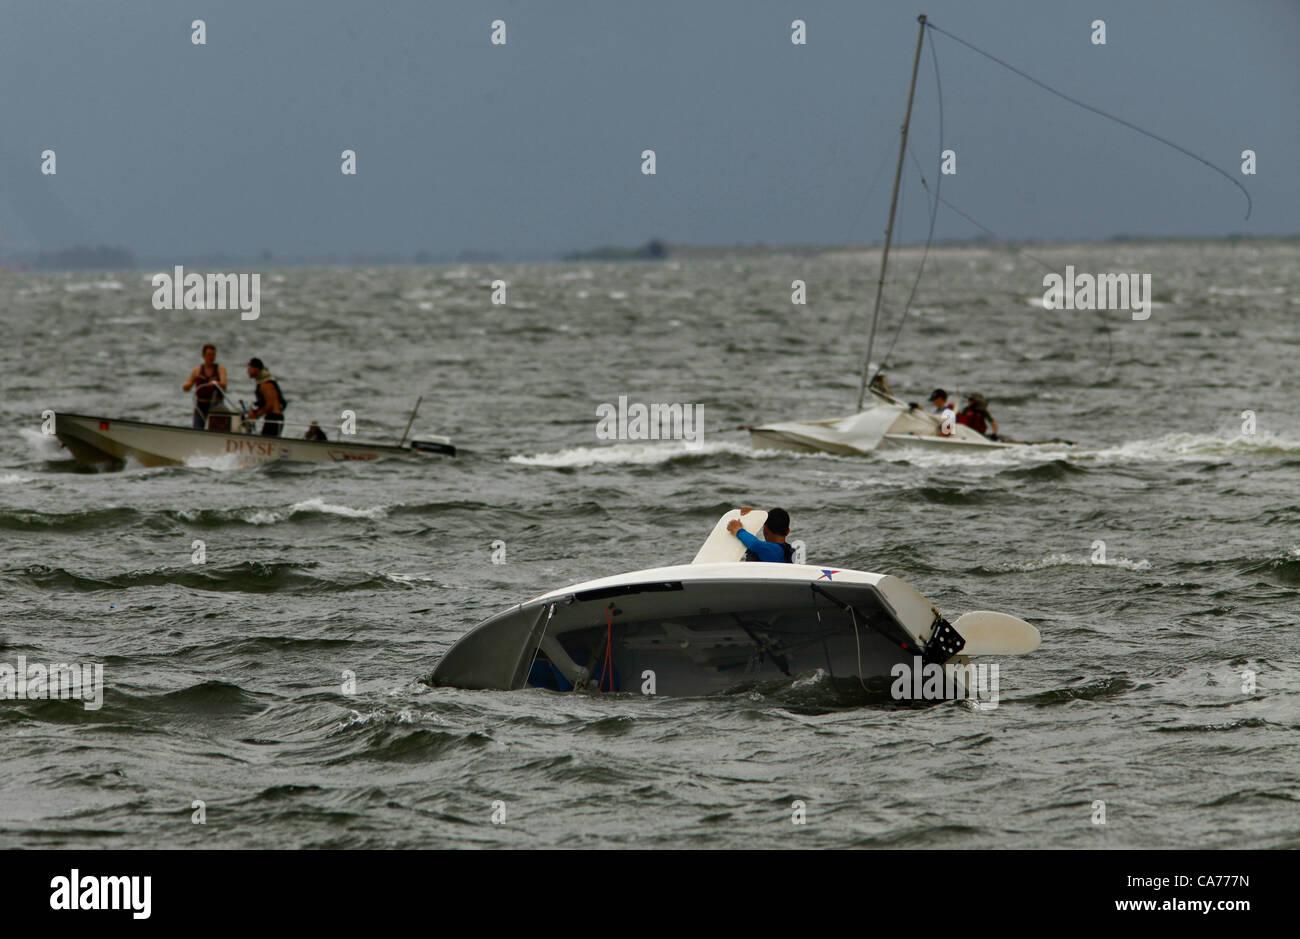 Centerboard Sailboat Stock Photos & Centerboard Sailboat Stock